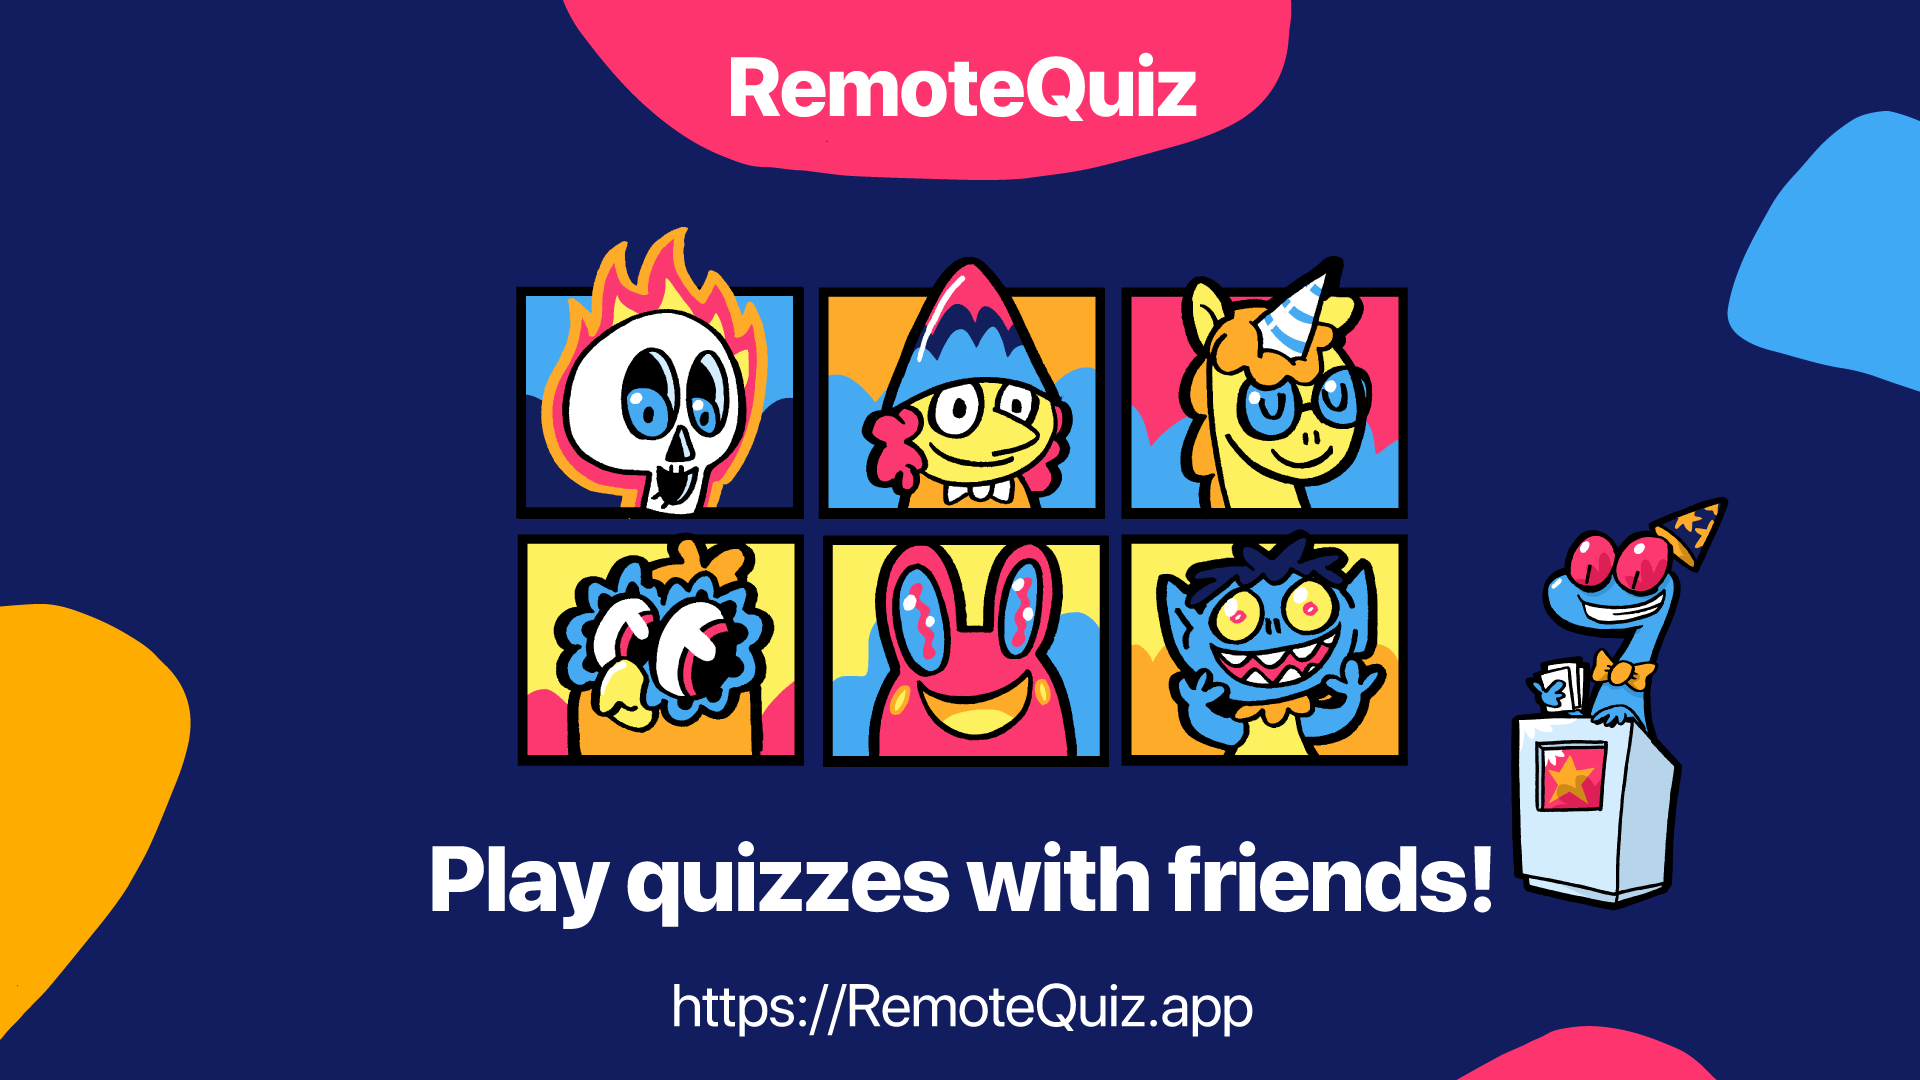 RemoteQuizz Illustrations